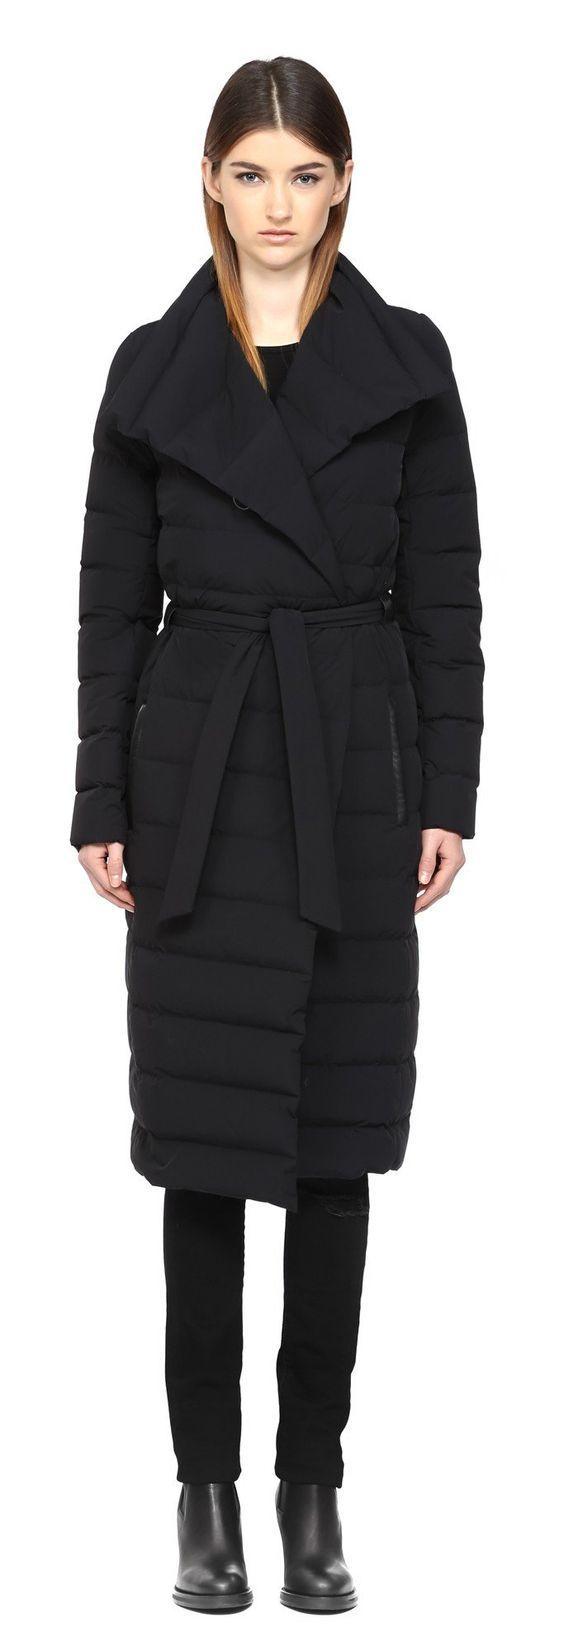 mackage lightweight long down coat | Fashion | Pinterest | Coats